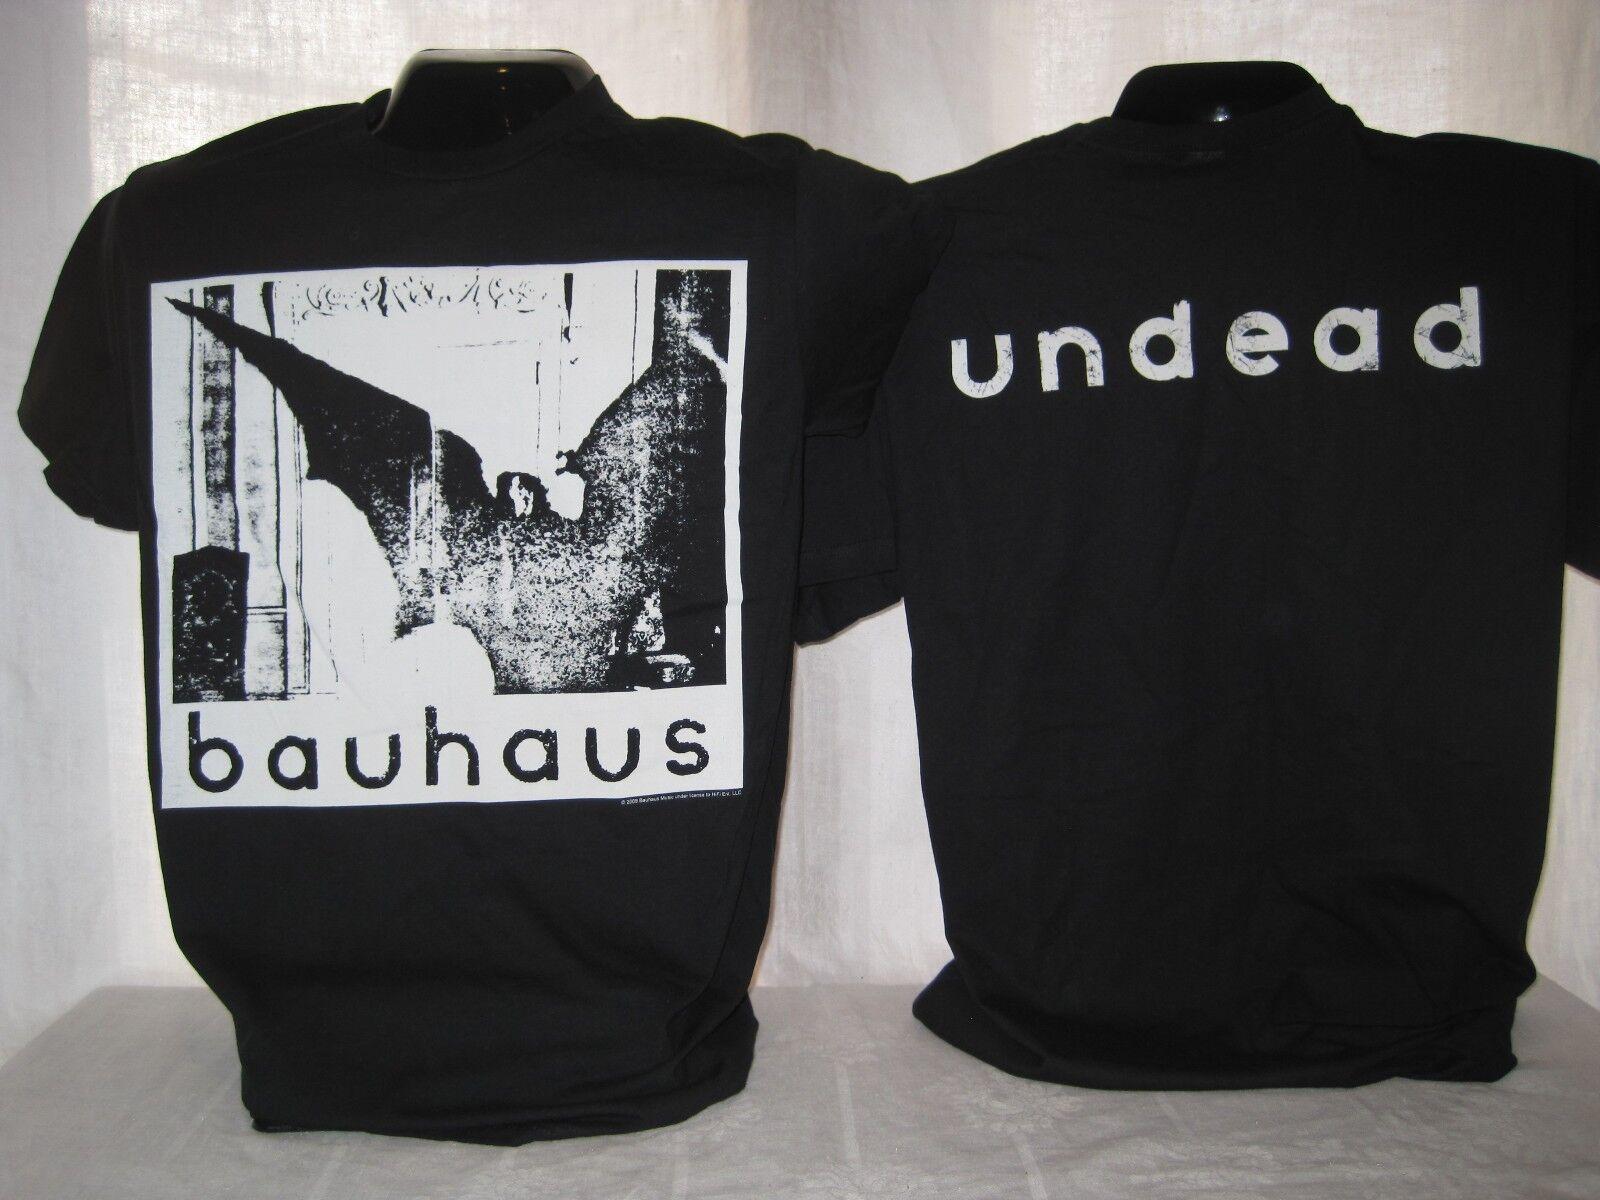 Bauhaus T-Shirt Tee Peter Murphy Ash Haskins Rock Band Music Apparel New 01